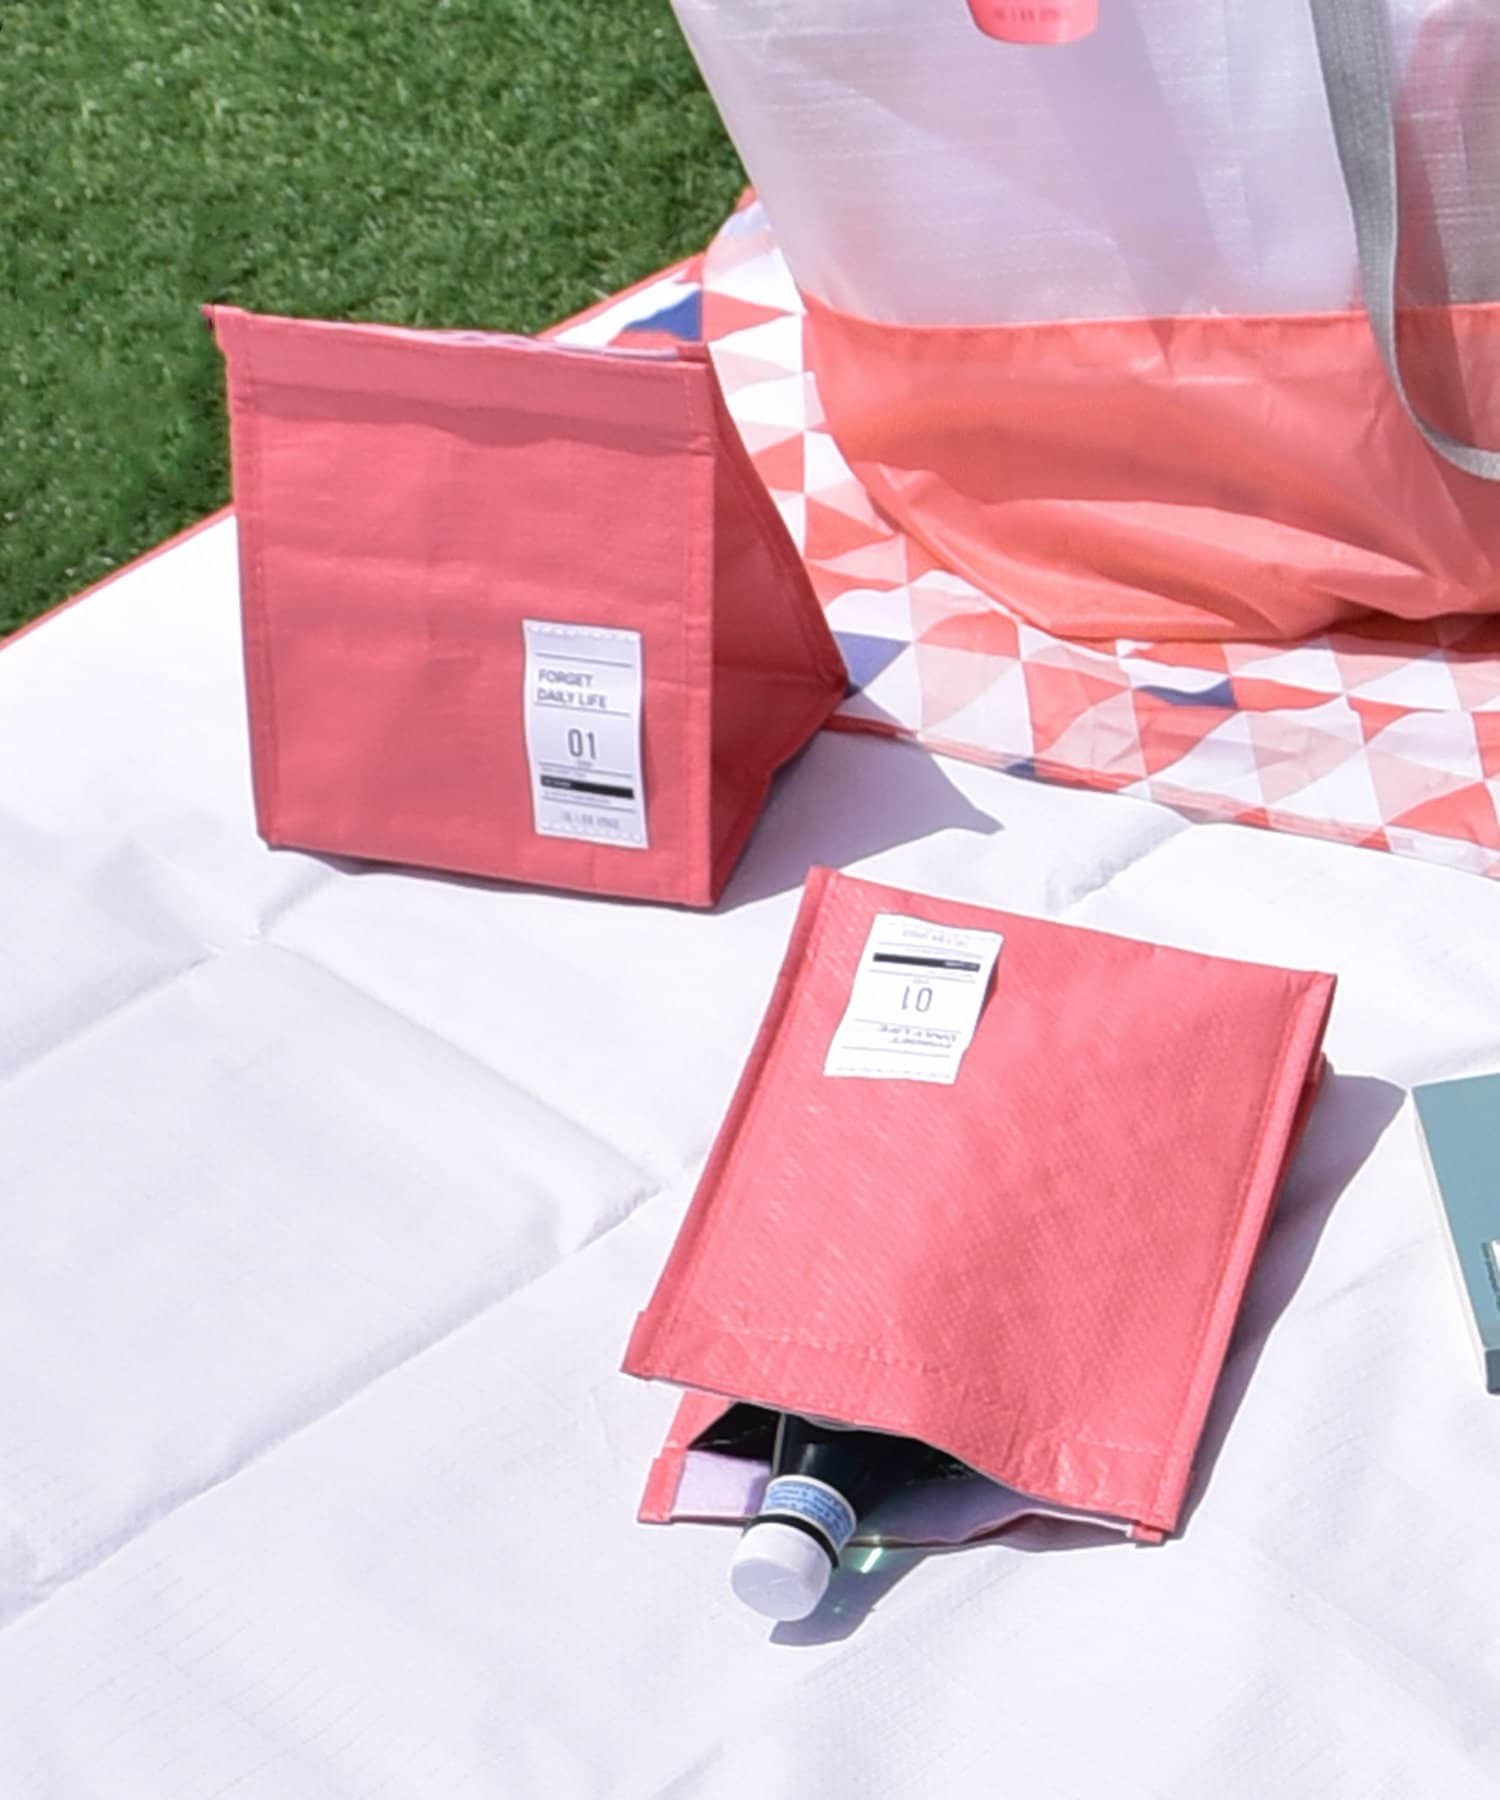 3COINS(スリーコインズ) ライフスタイル 【GIRLY PICNIC】保冷ポーチ2個SET ピンク